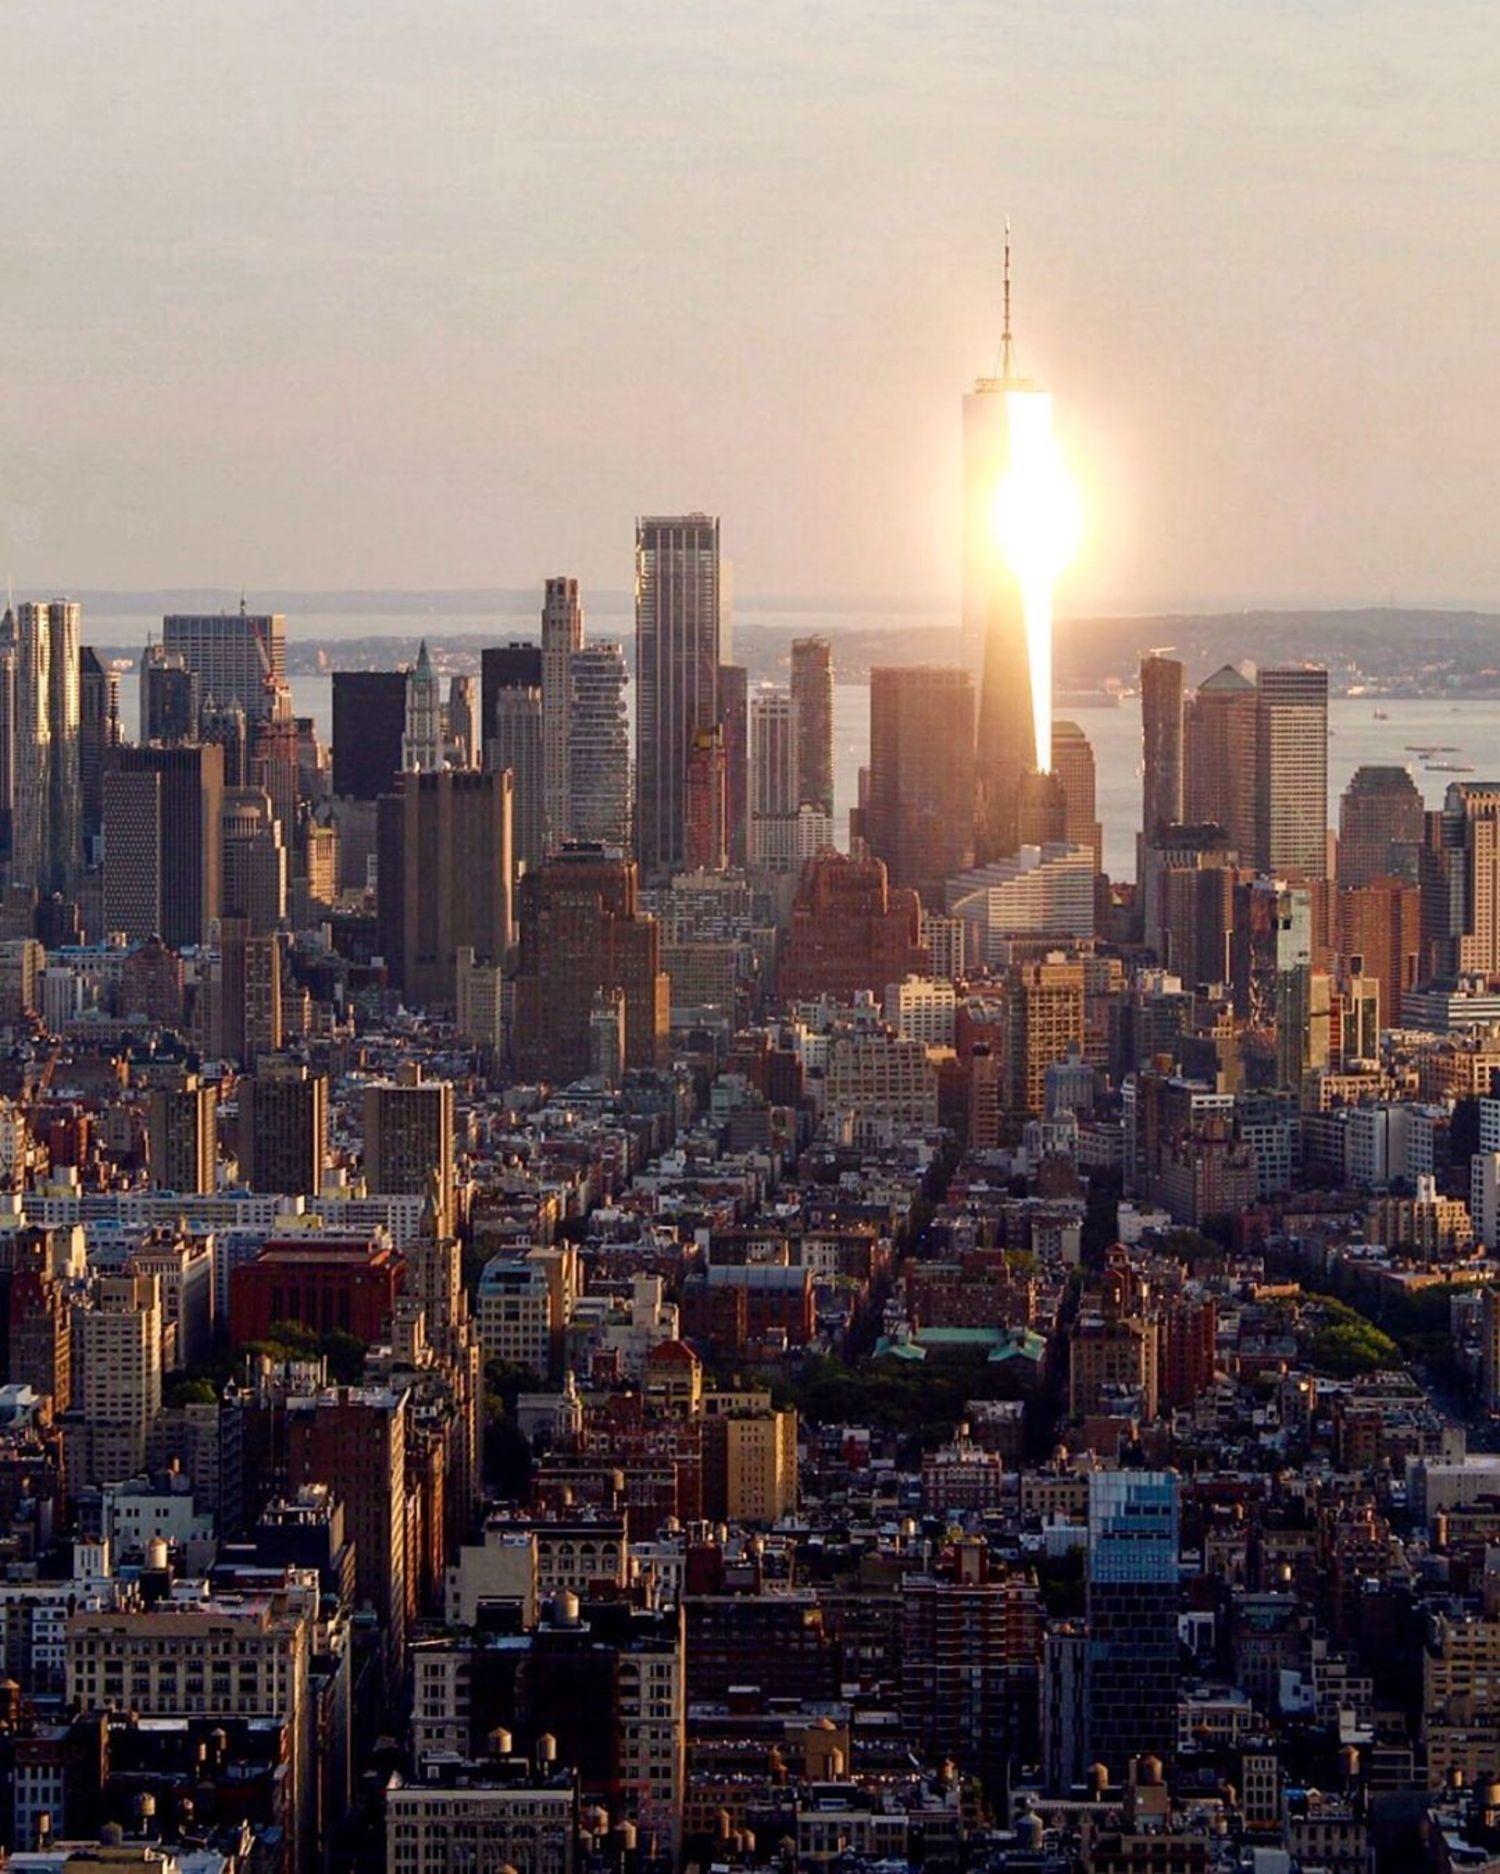 Golden Hour over Lower Manhattan